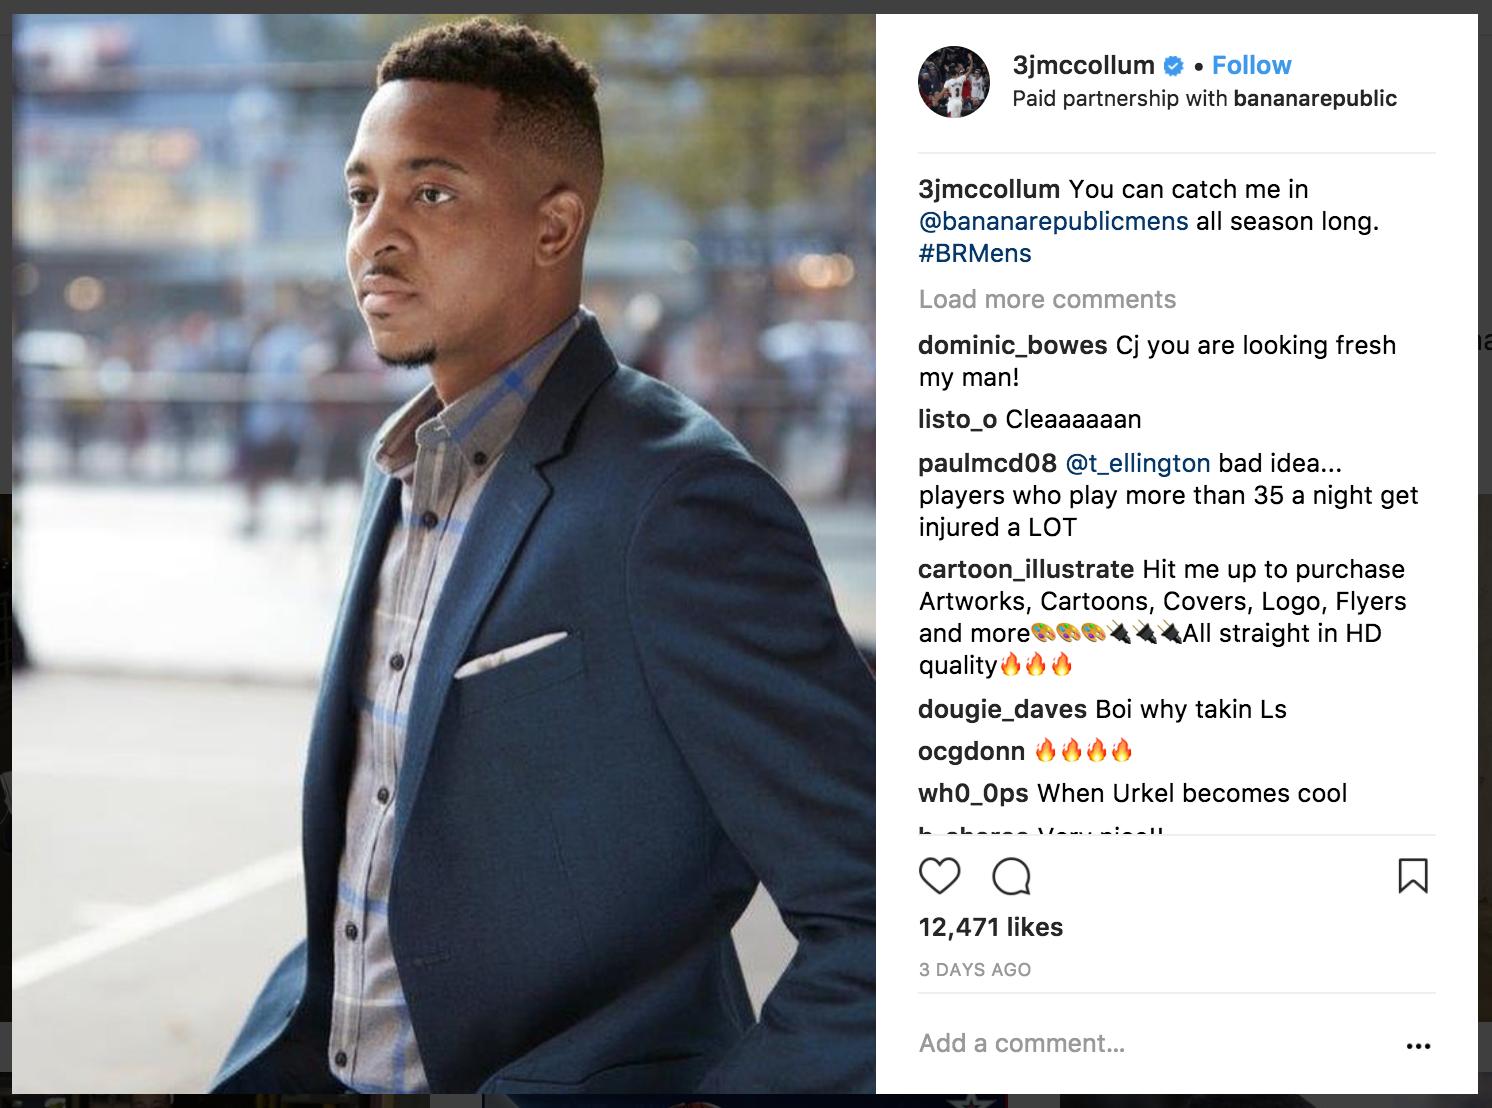 Instagram paid sponsorship